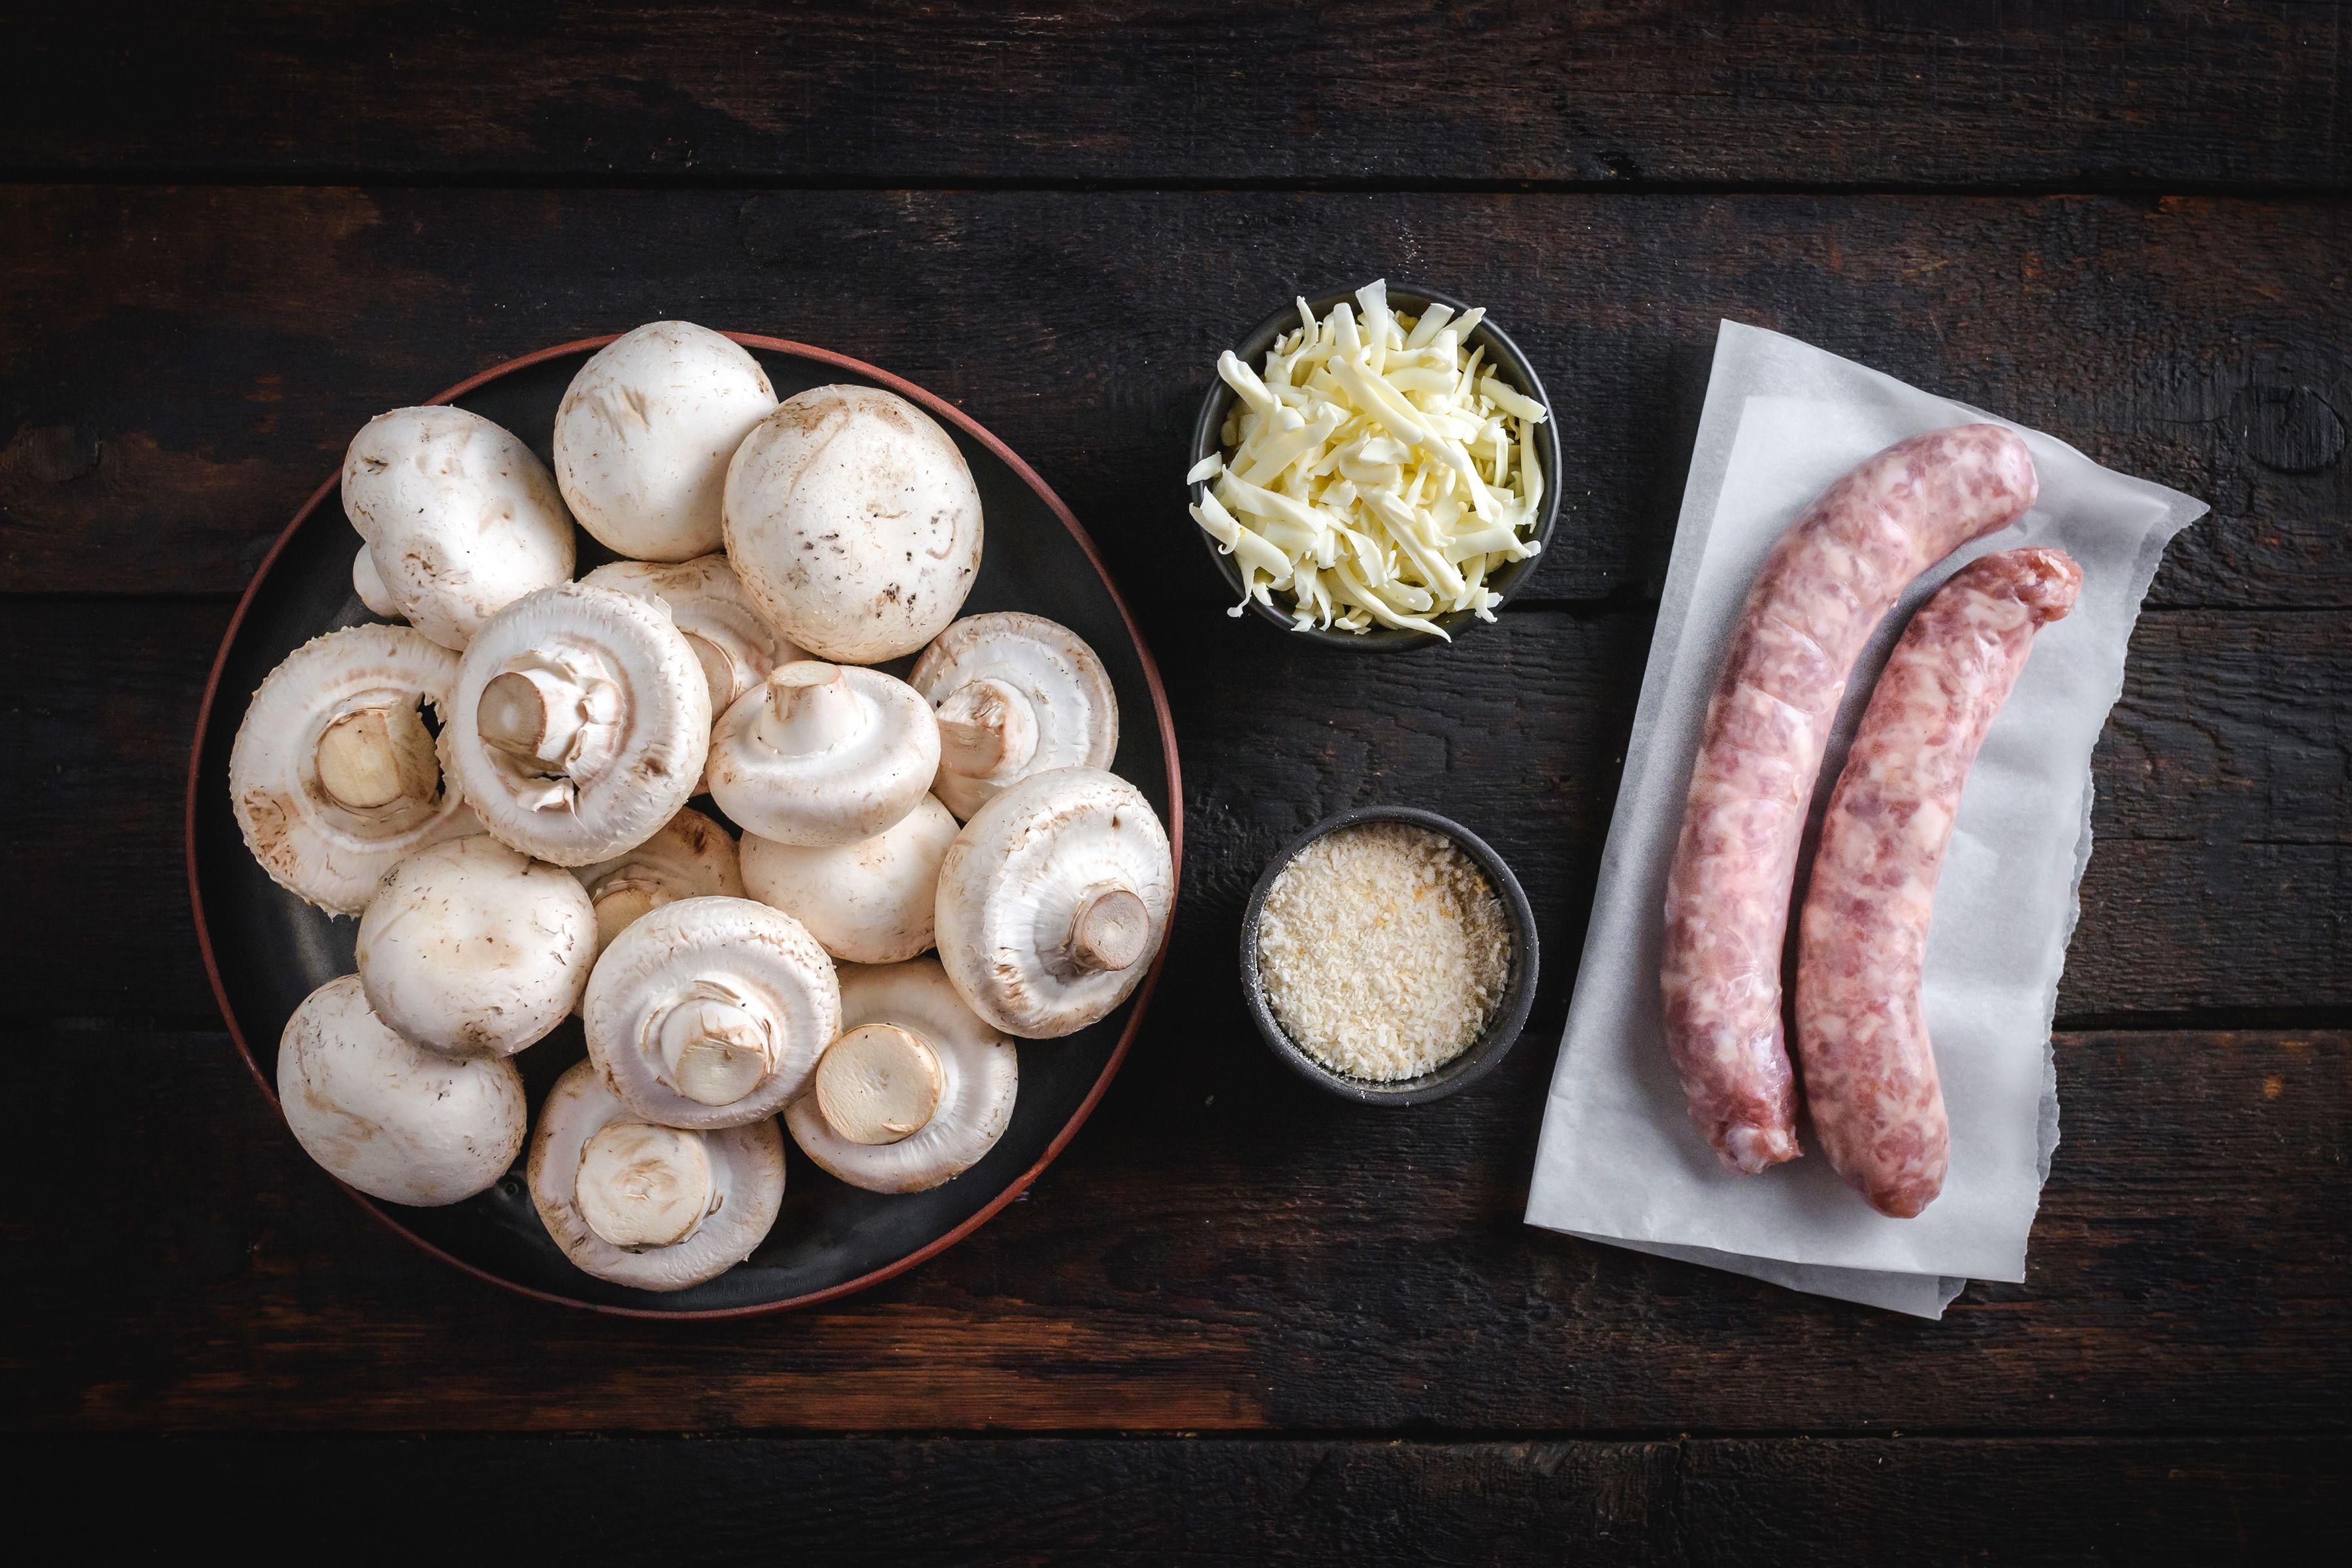 Ingredients for sausage-stuffed mushrooms